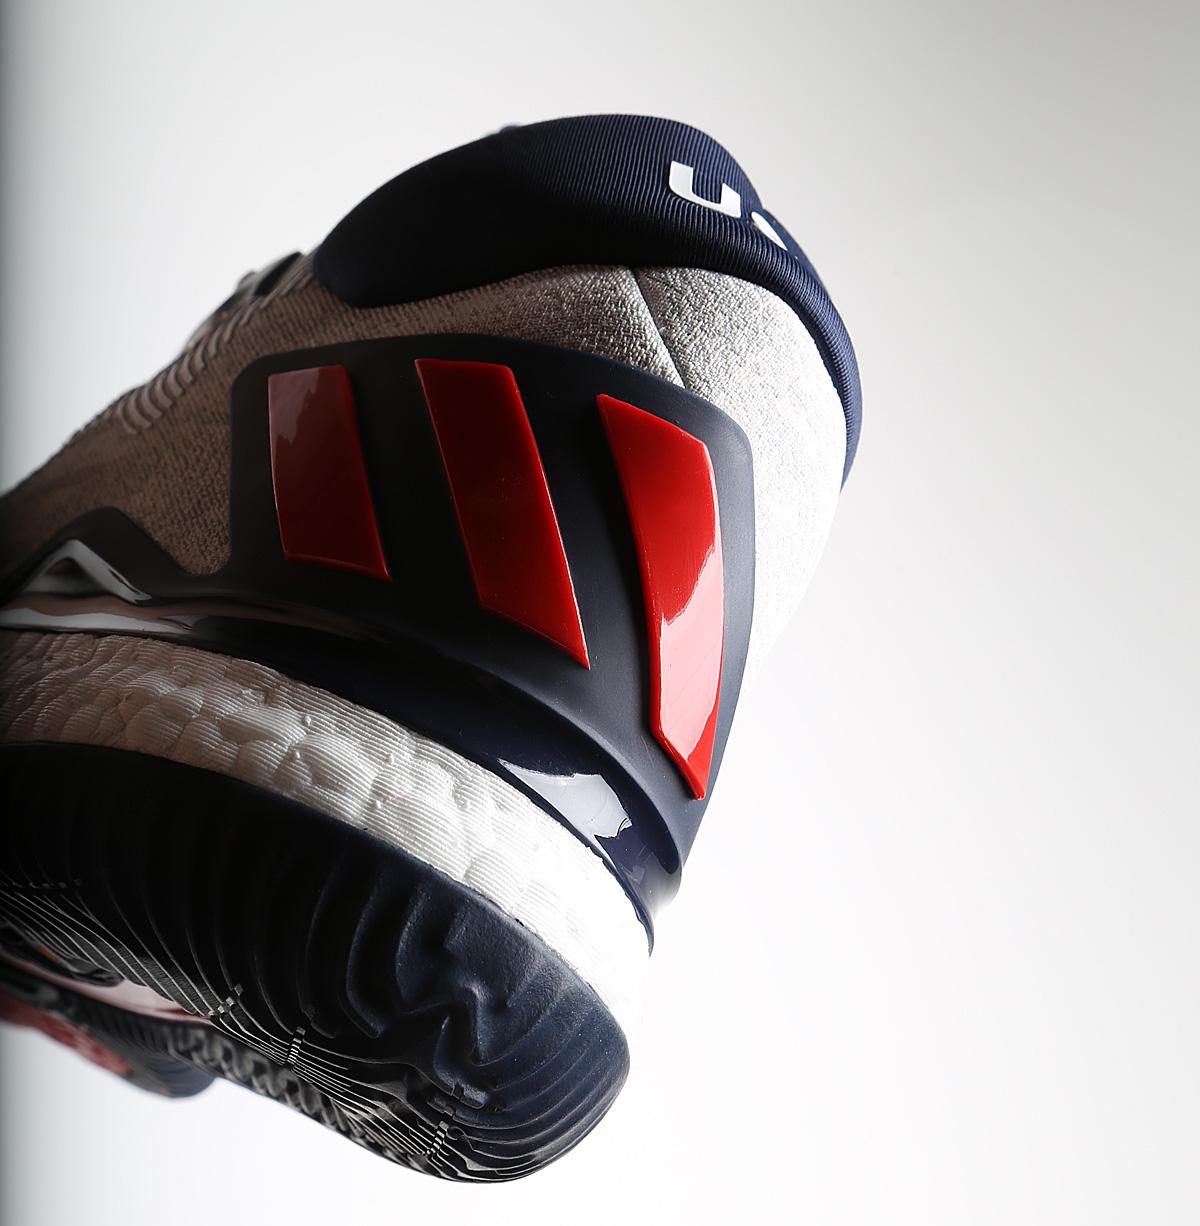 Kyle-Lowry-USA-Olympics-adidas-Crazylight-Boost-2016-12